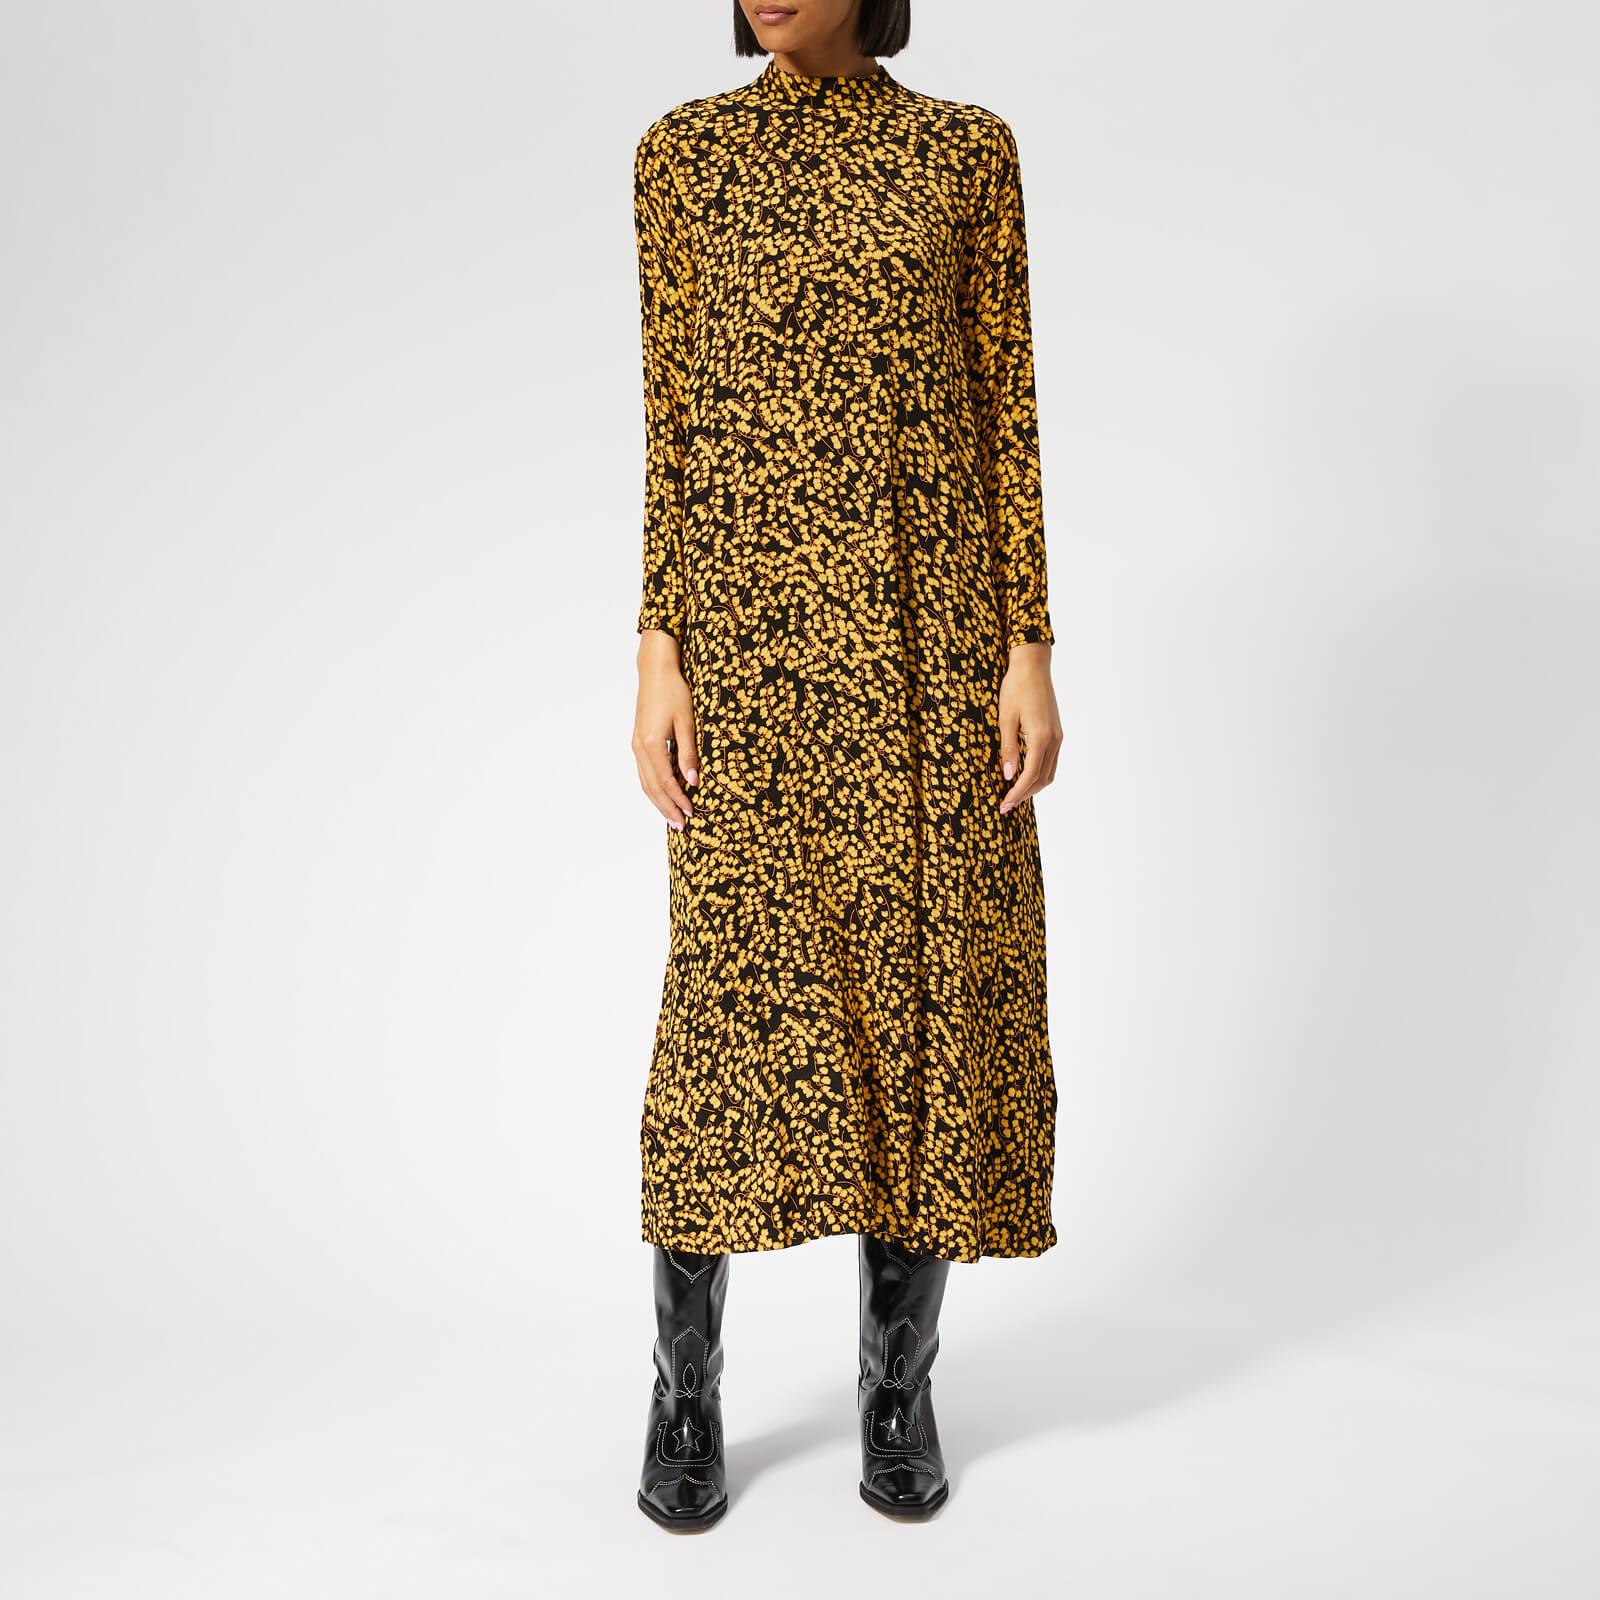 94bc32de5a96 Ganni Women s Goldstone Crepe Dress - Black - Free UK Delivery over £50